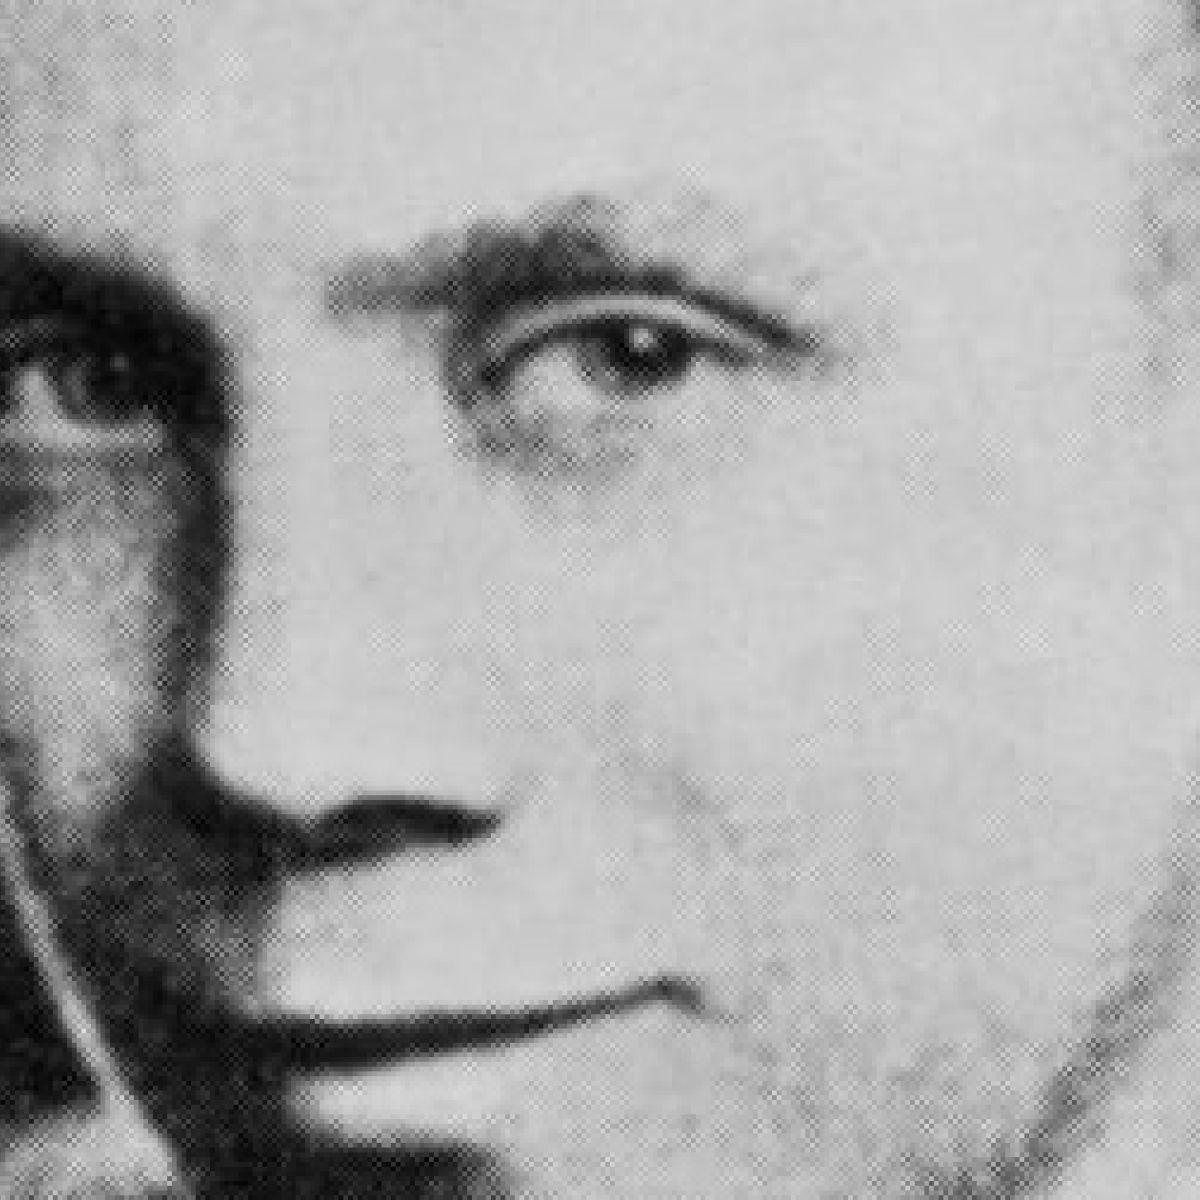 Thomas Merton: from wayward youth to man of God